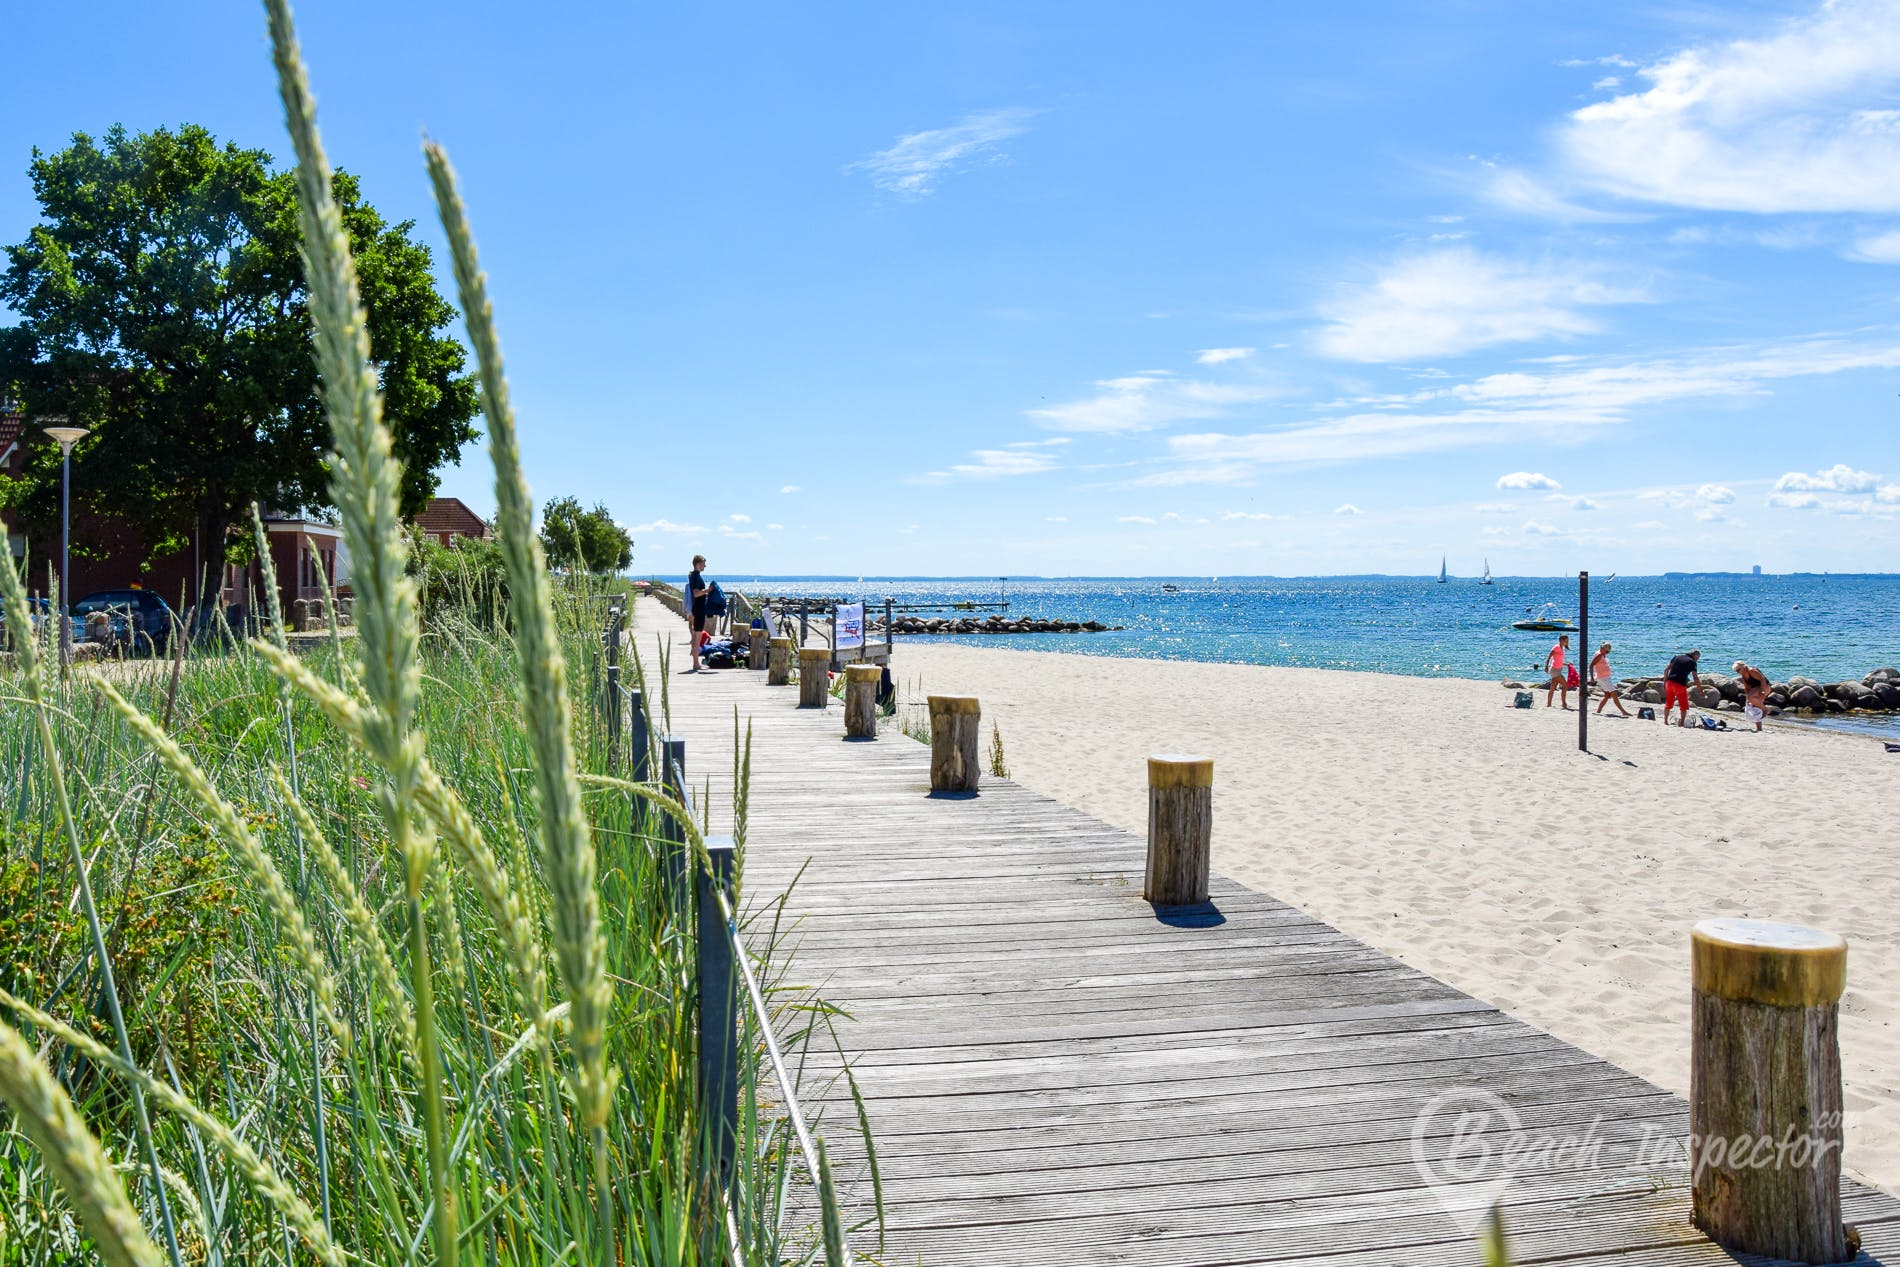 Beach Strand Neustadt, Lübecker Bucht, Germany